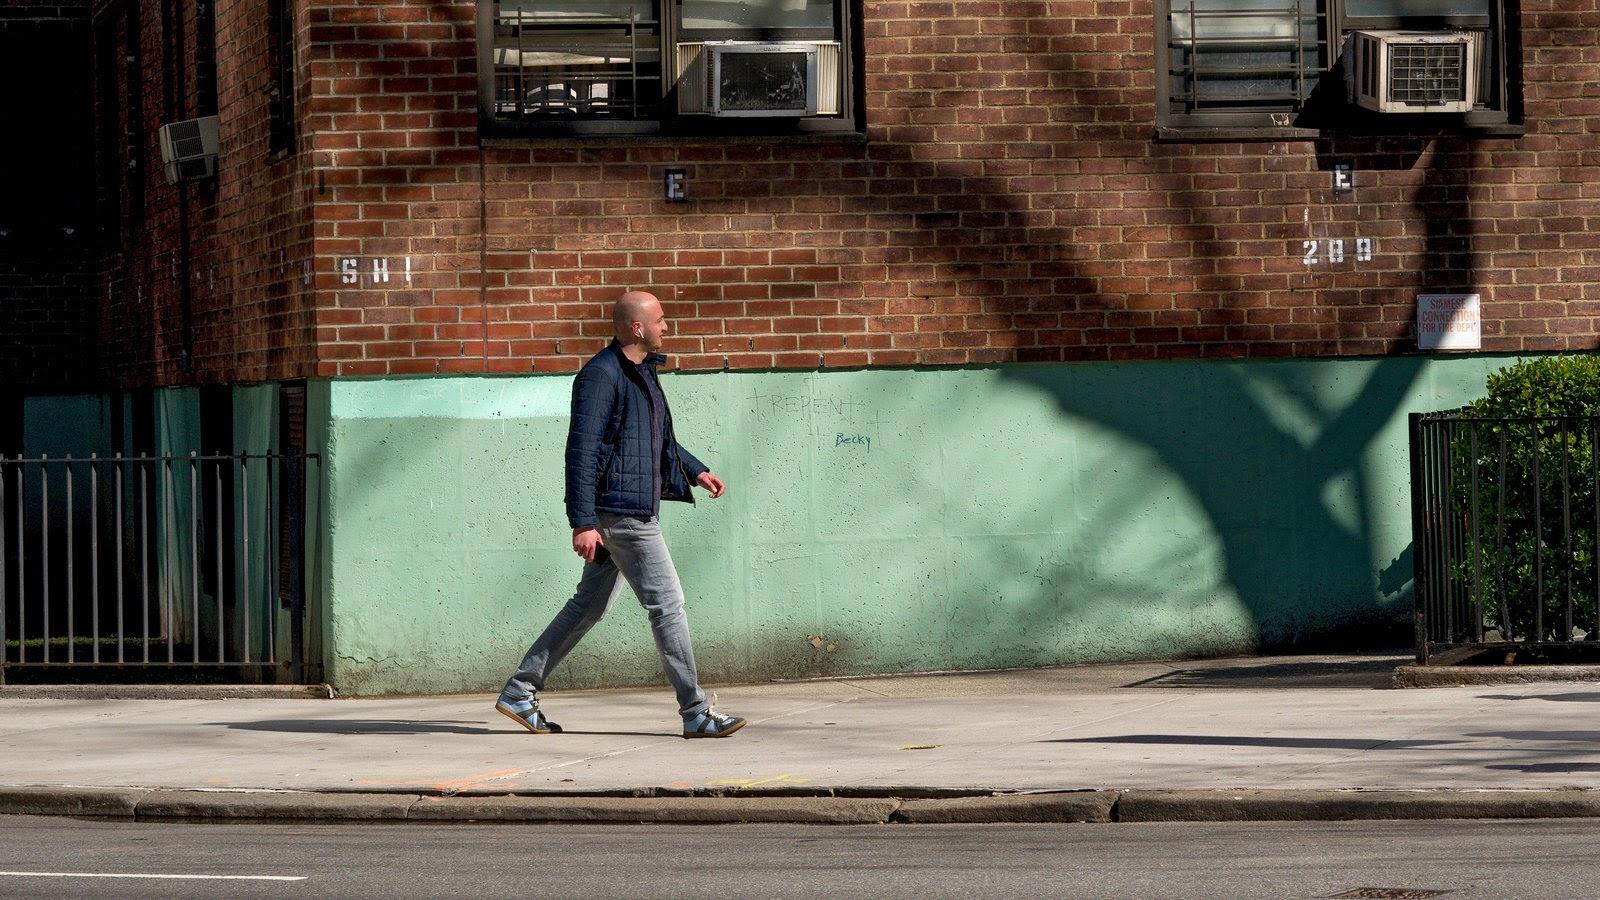 A man walking by himself on a sidewalk.